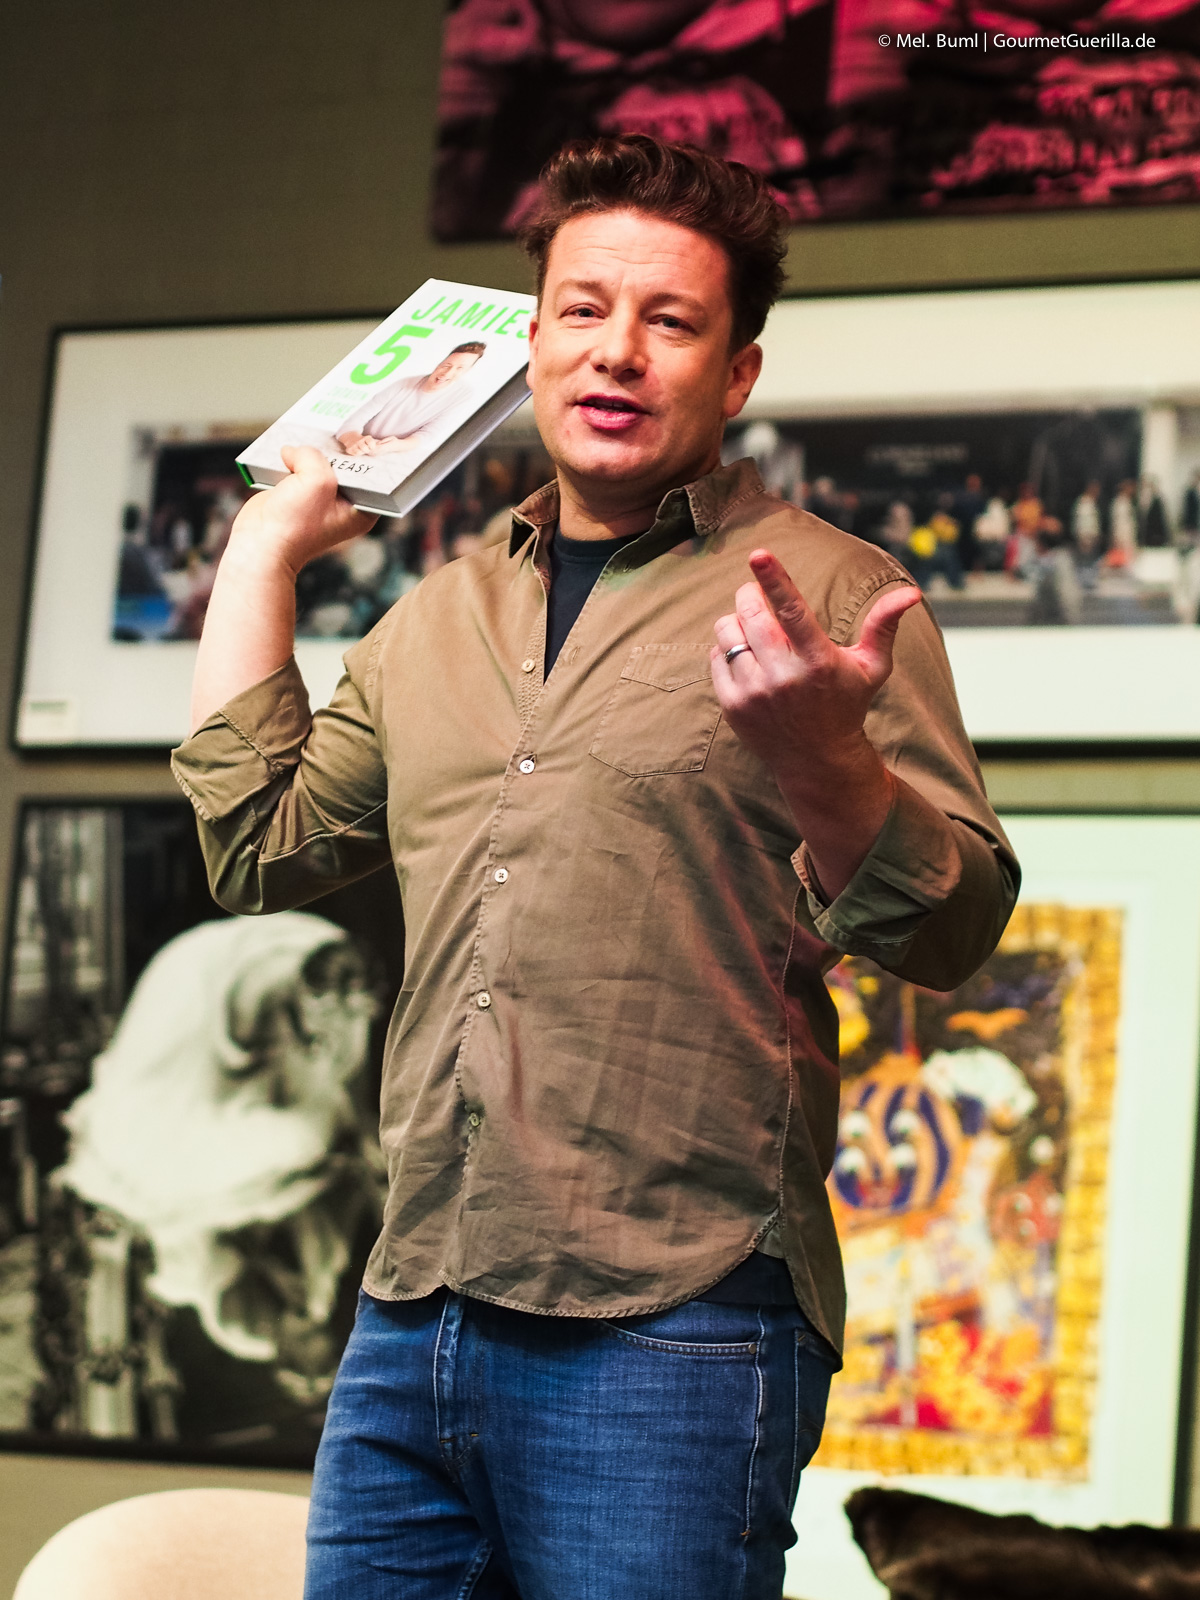 GourmetGuerilla meets Jamie Oliver |GourmetGuerilla.de